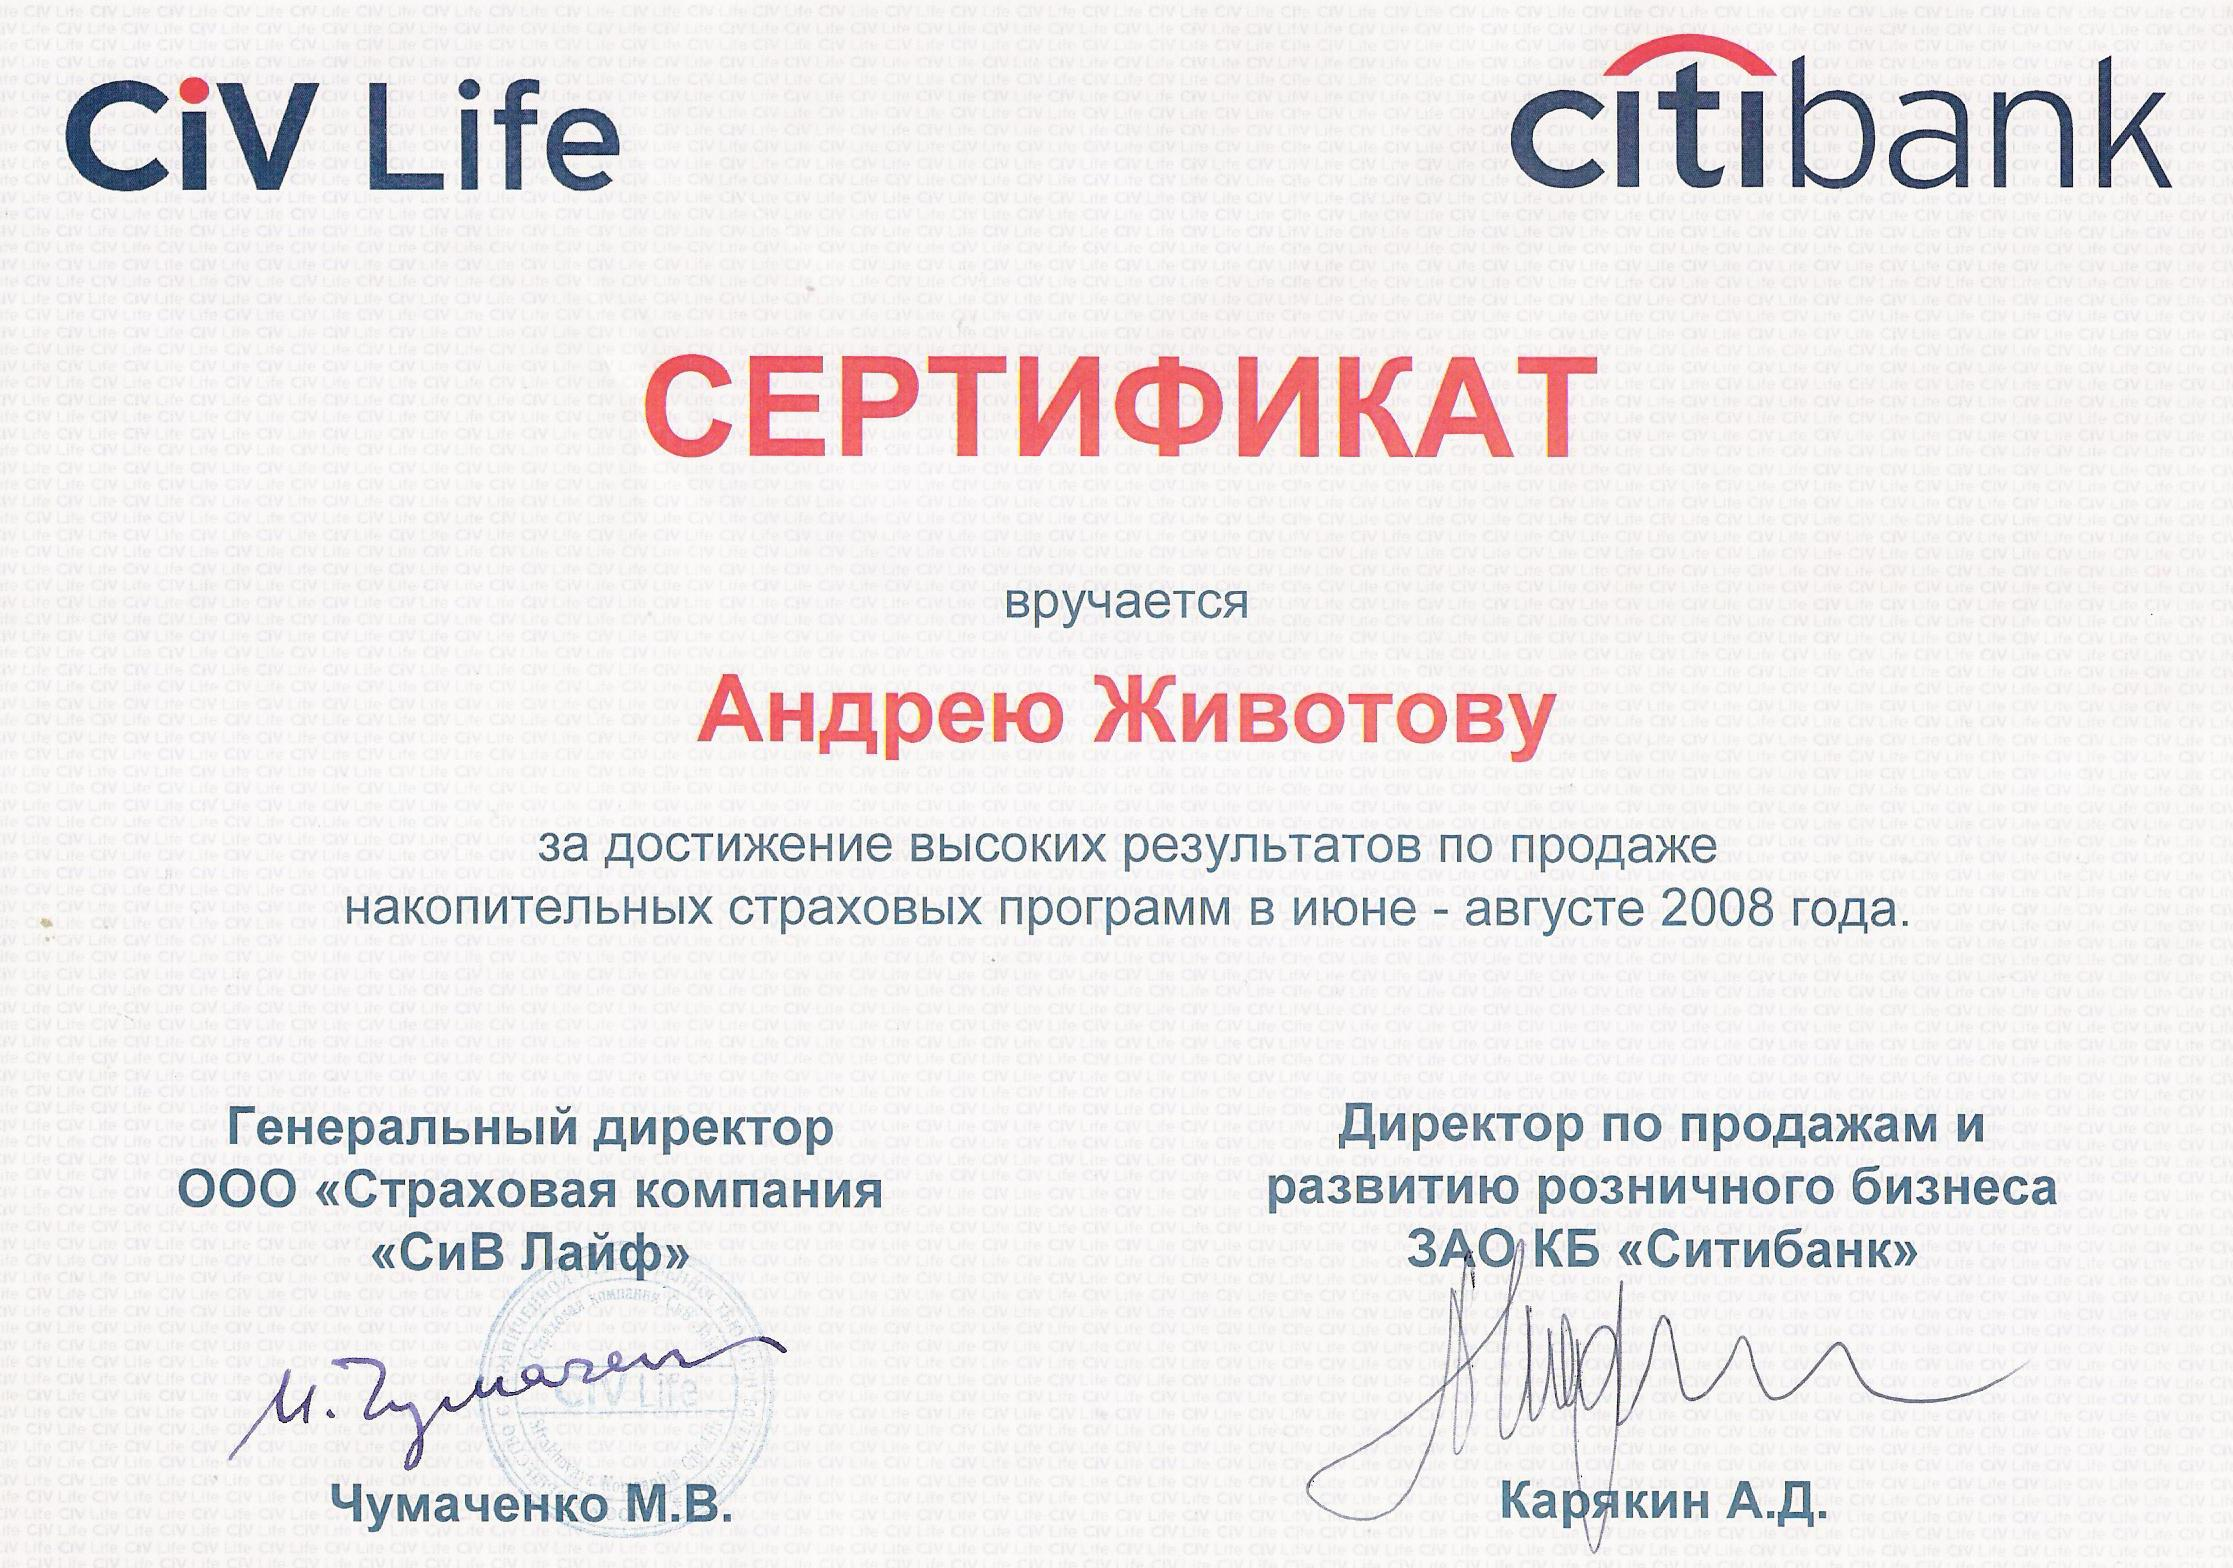 Андрей Животов CiV Life Ситибанк Андрей Карякин